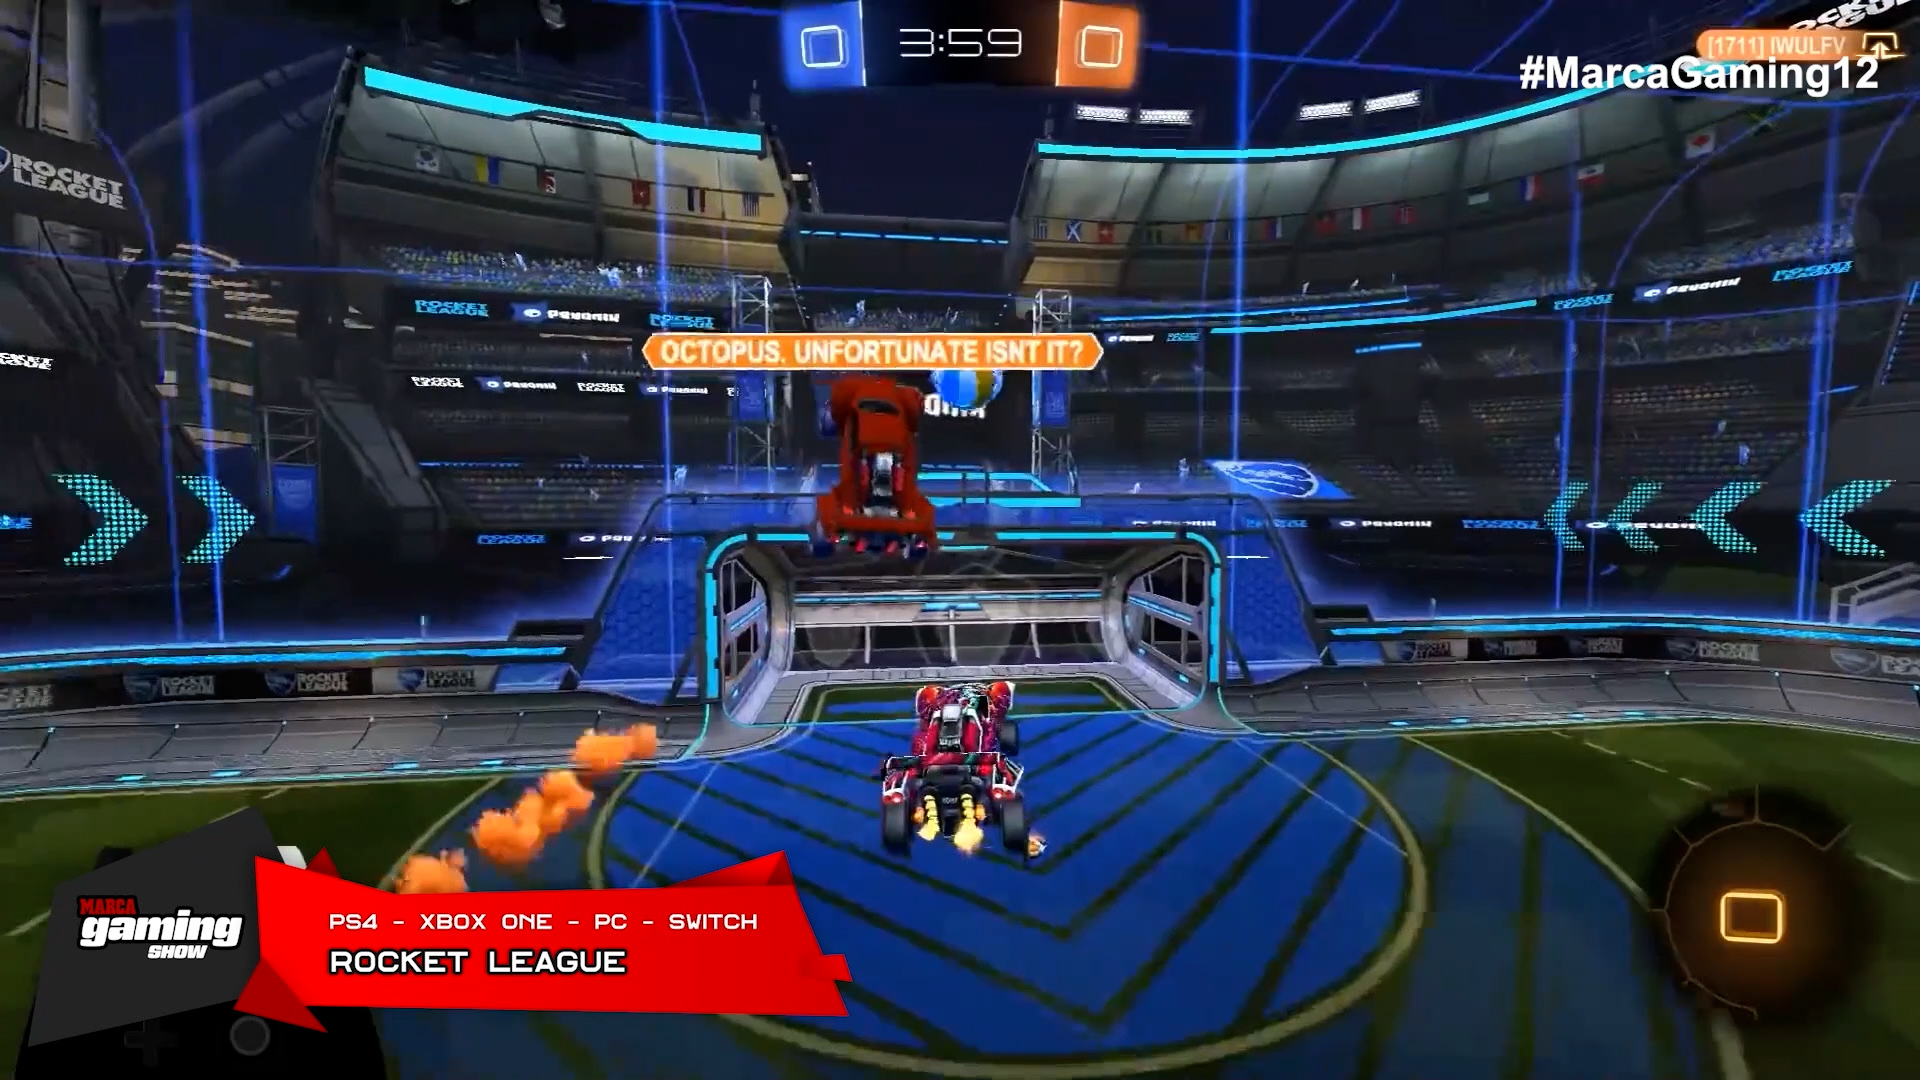 Rocket League ( PC - PS4 - XBOX ONE - SWITCH )